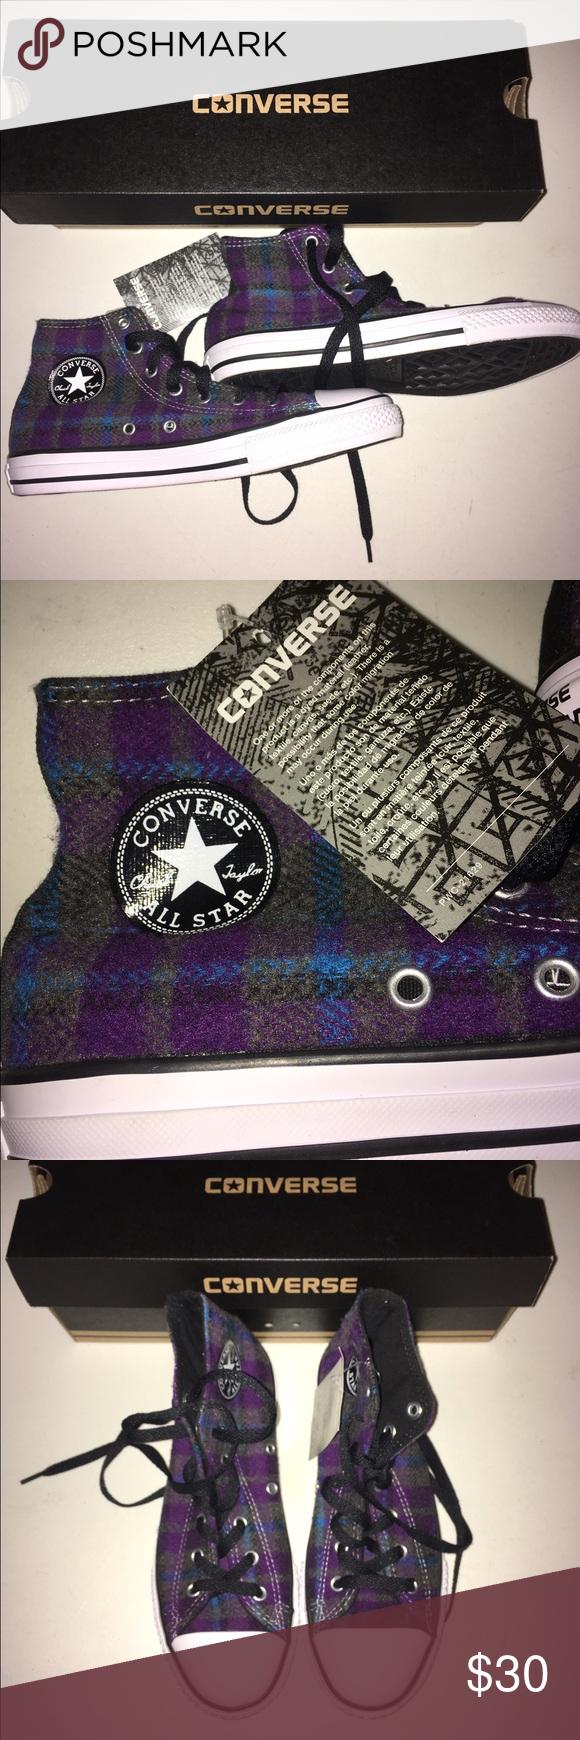 Converse sneakers Chuck Taylor kids size 1 NIB NWT  b75fe340e